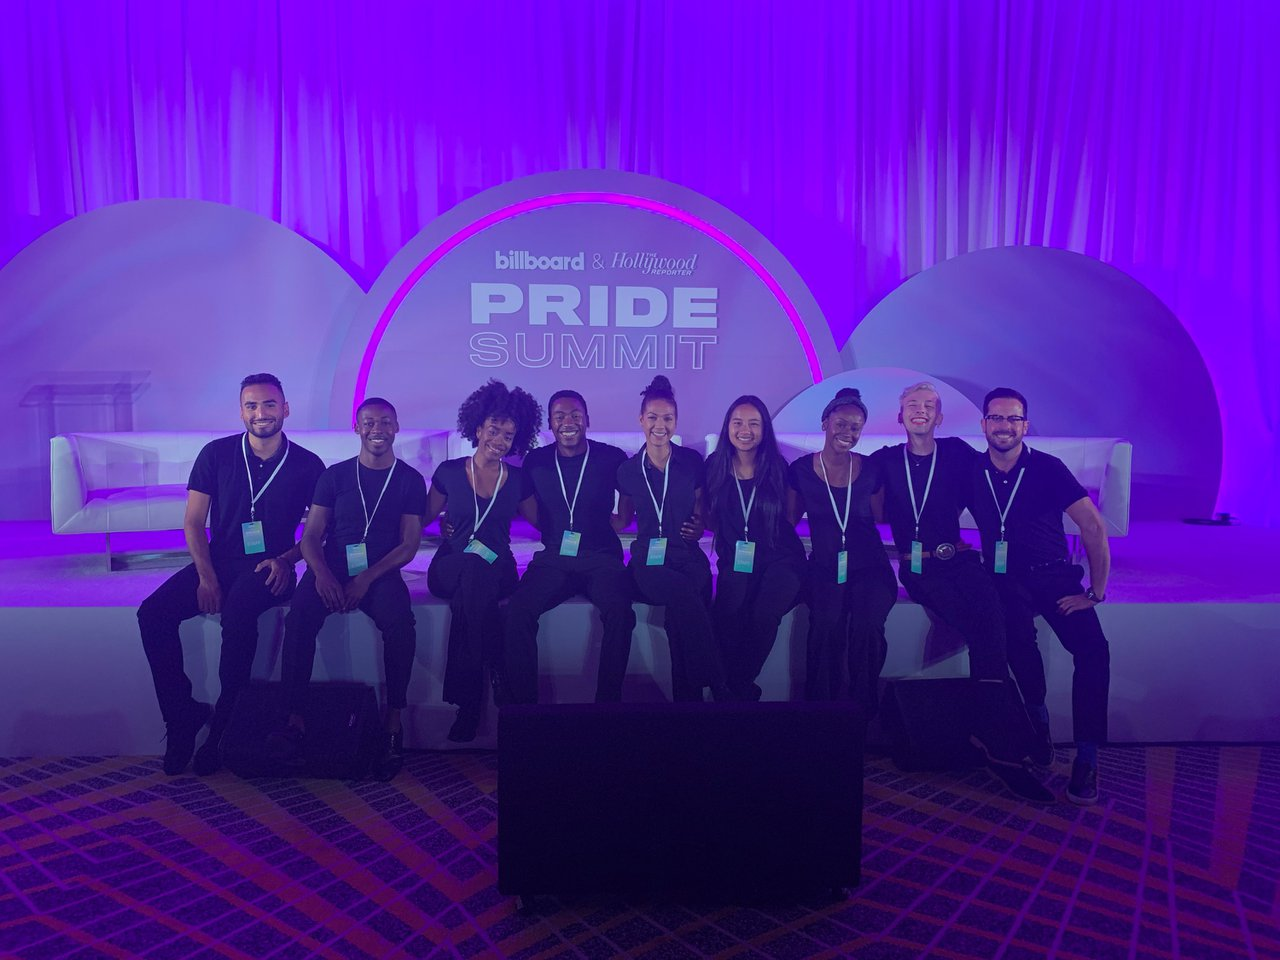 Billboard Pride Summit photo IMG_3233 copy.jpg